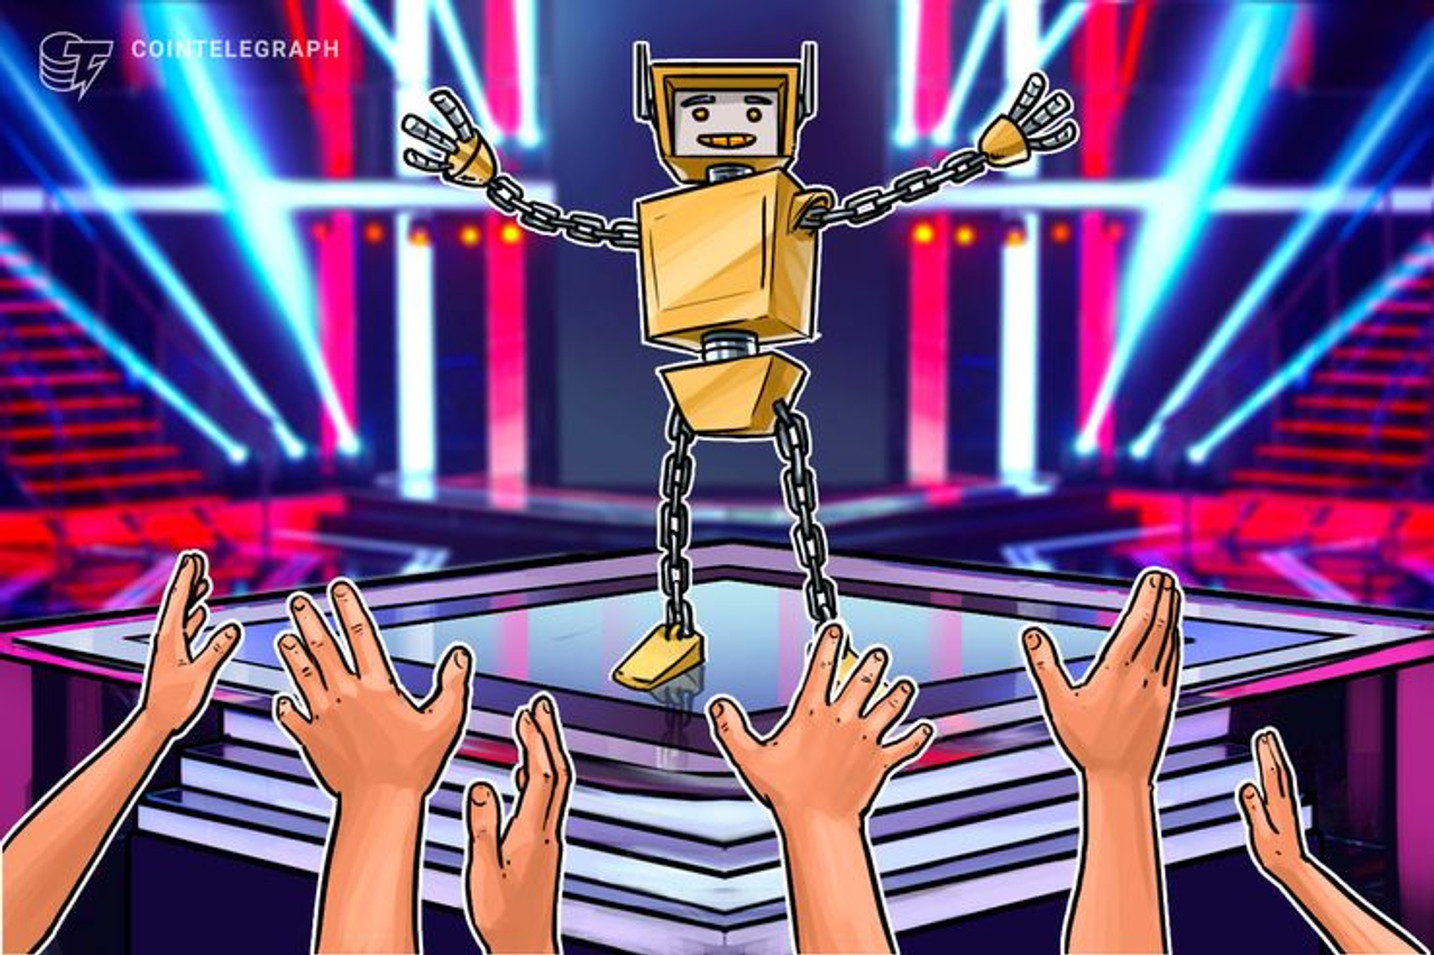 En sólo dos días, Talent Land Latinoamérica superó el millón de usuarios conectados